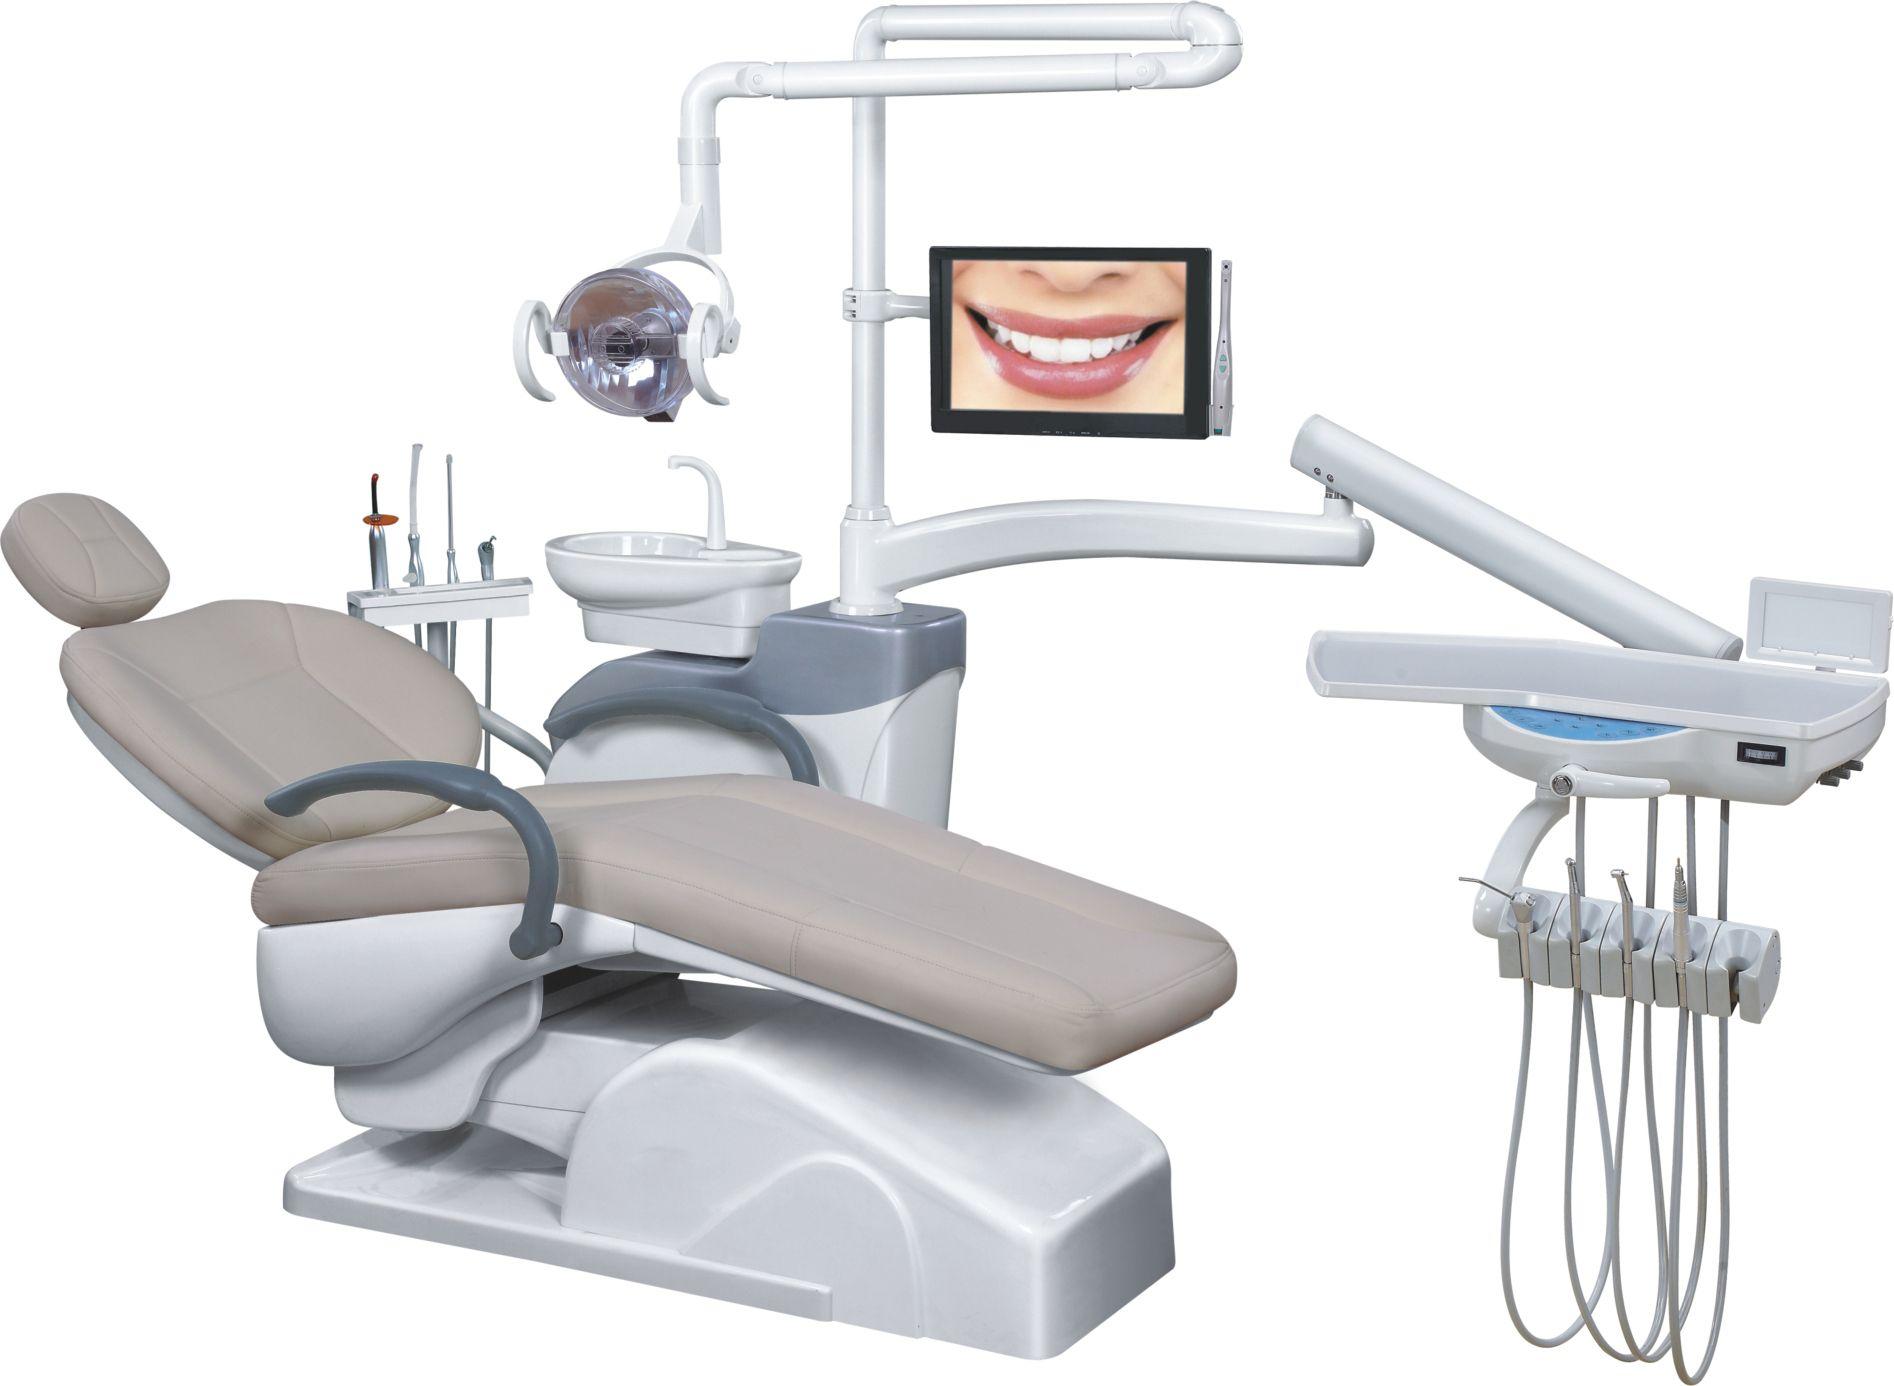 msl top mounted dental chair for sale best ergonomic dental chair